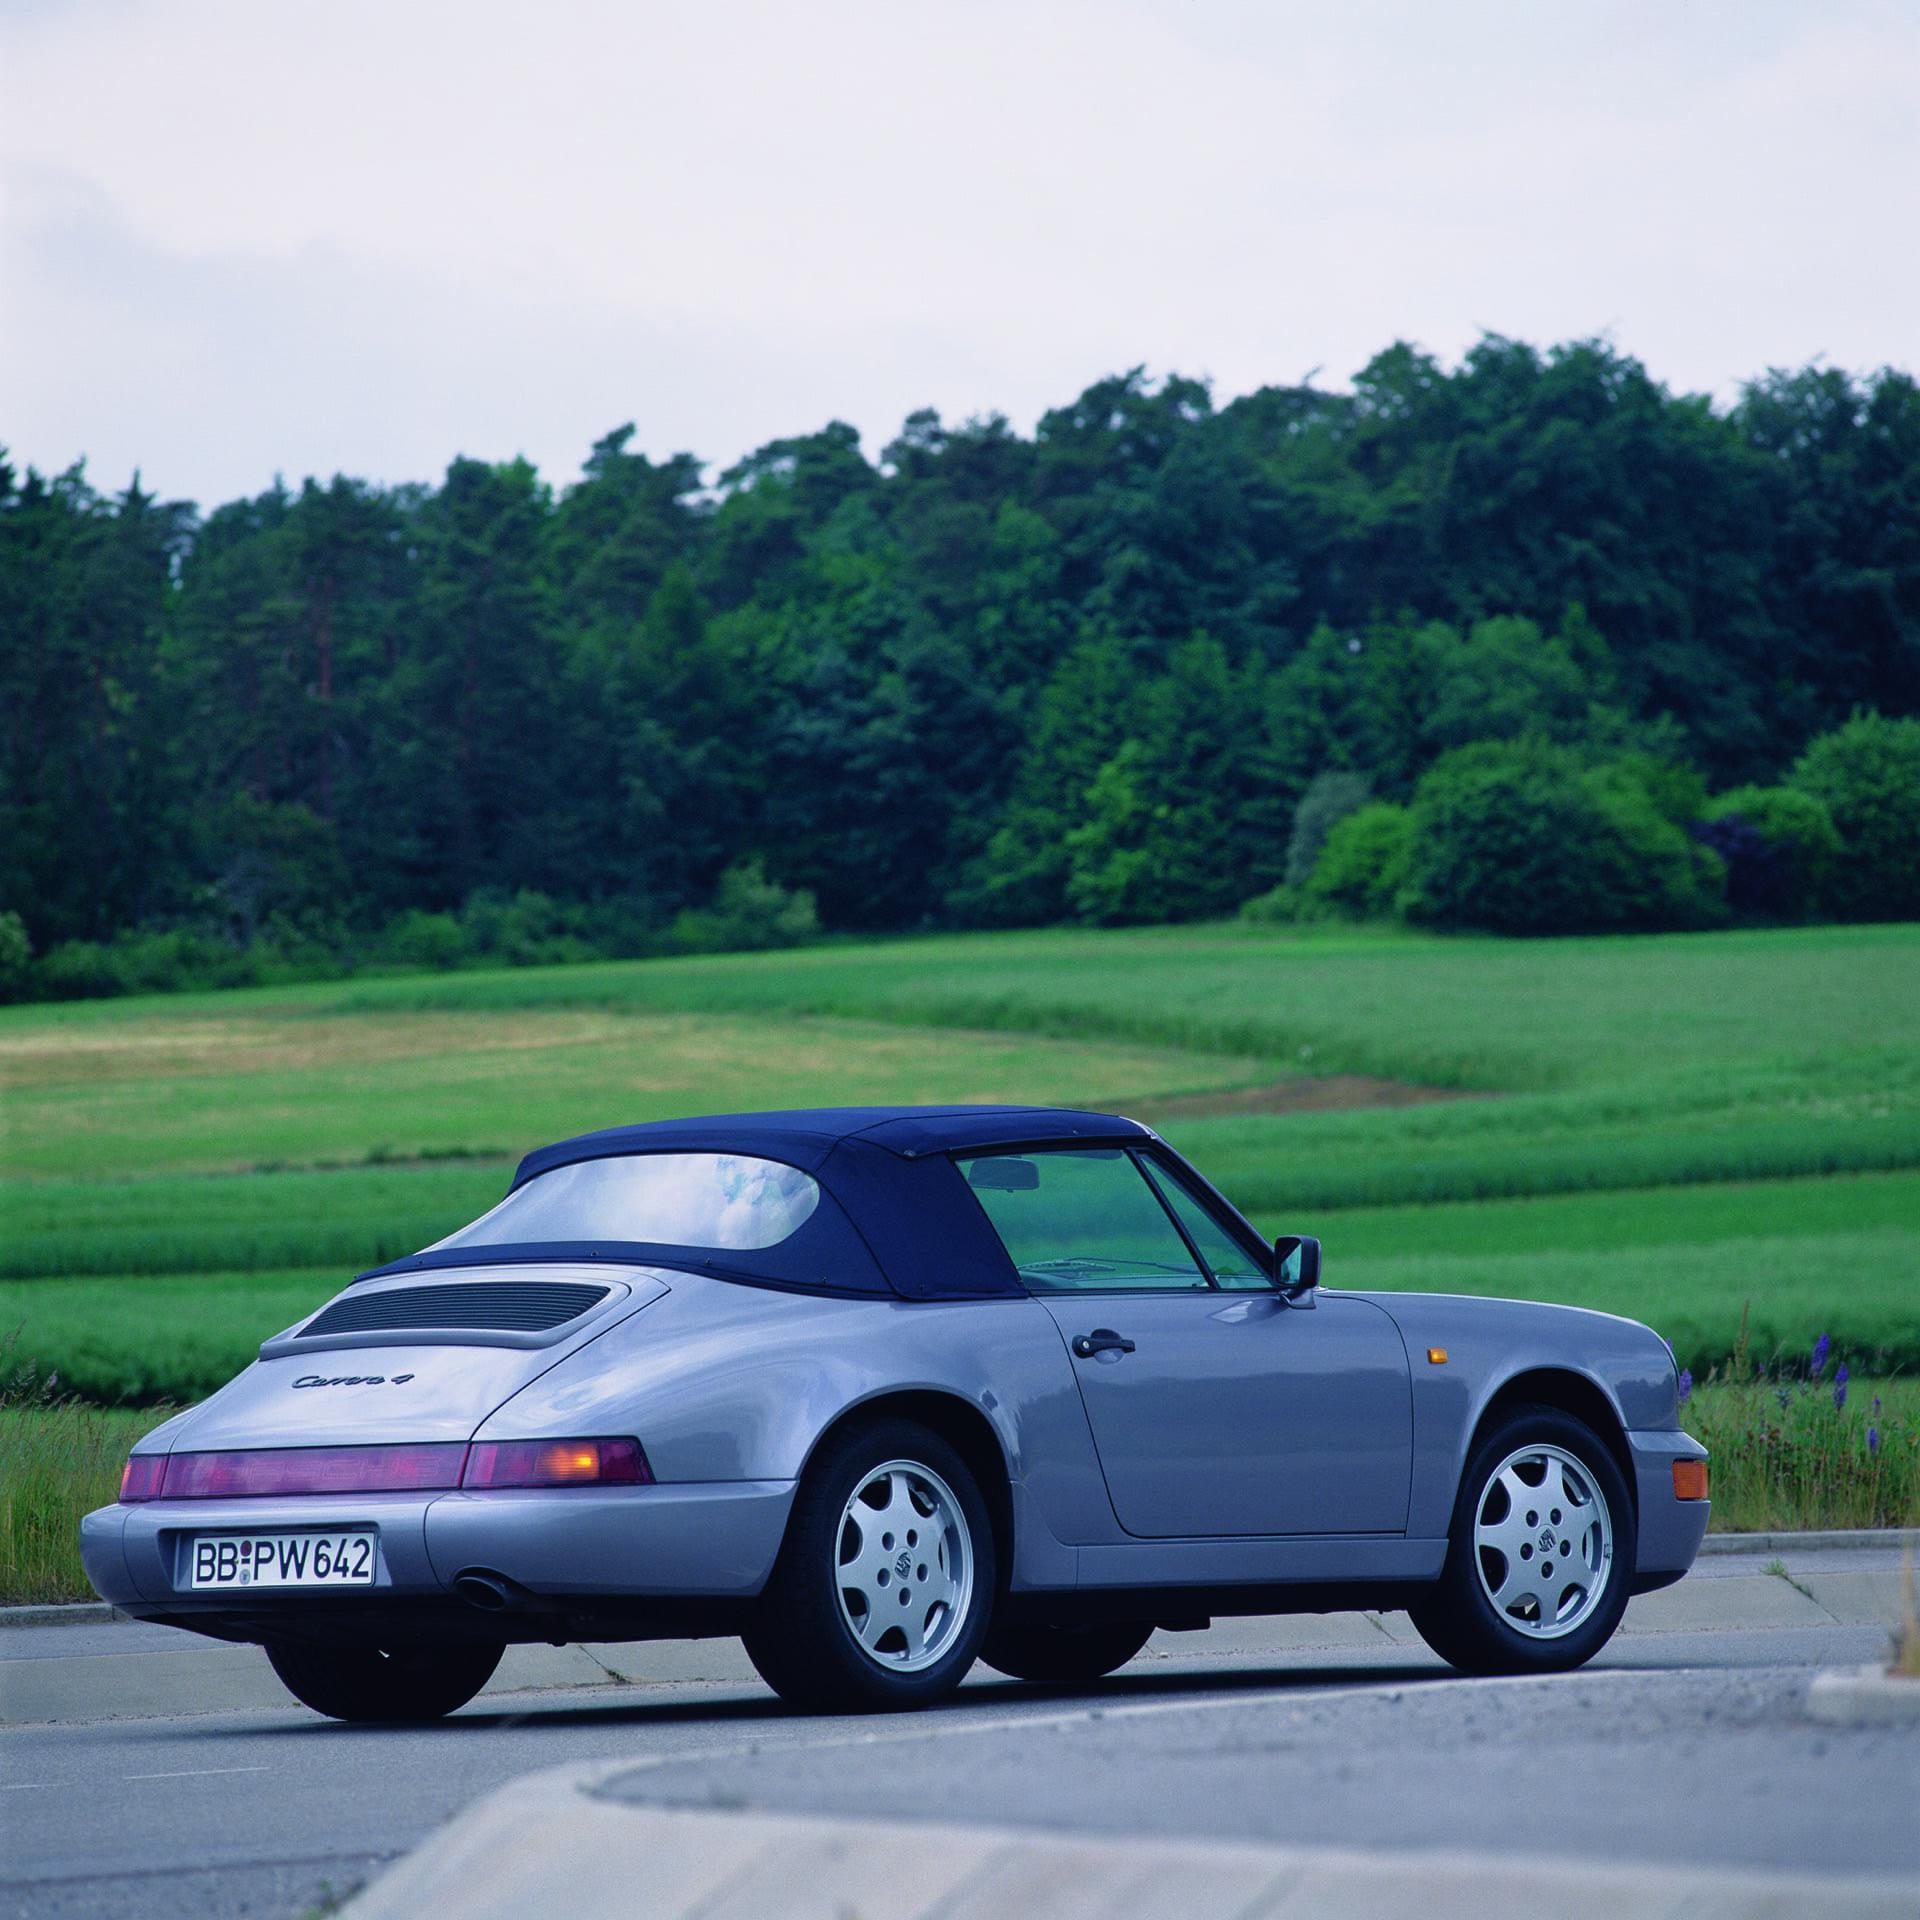 Porsche 911 964 Carrera 4 3 6 Cabriolet 1990